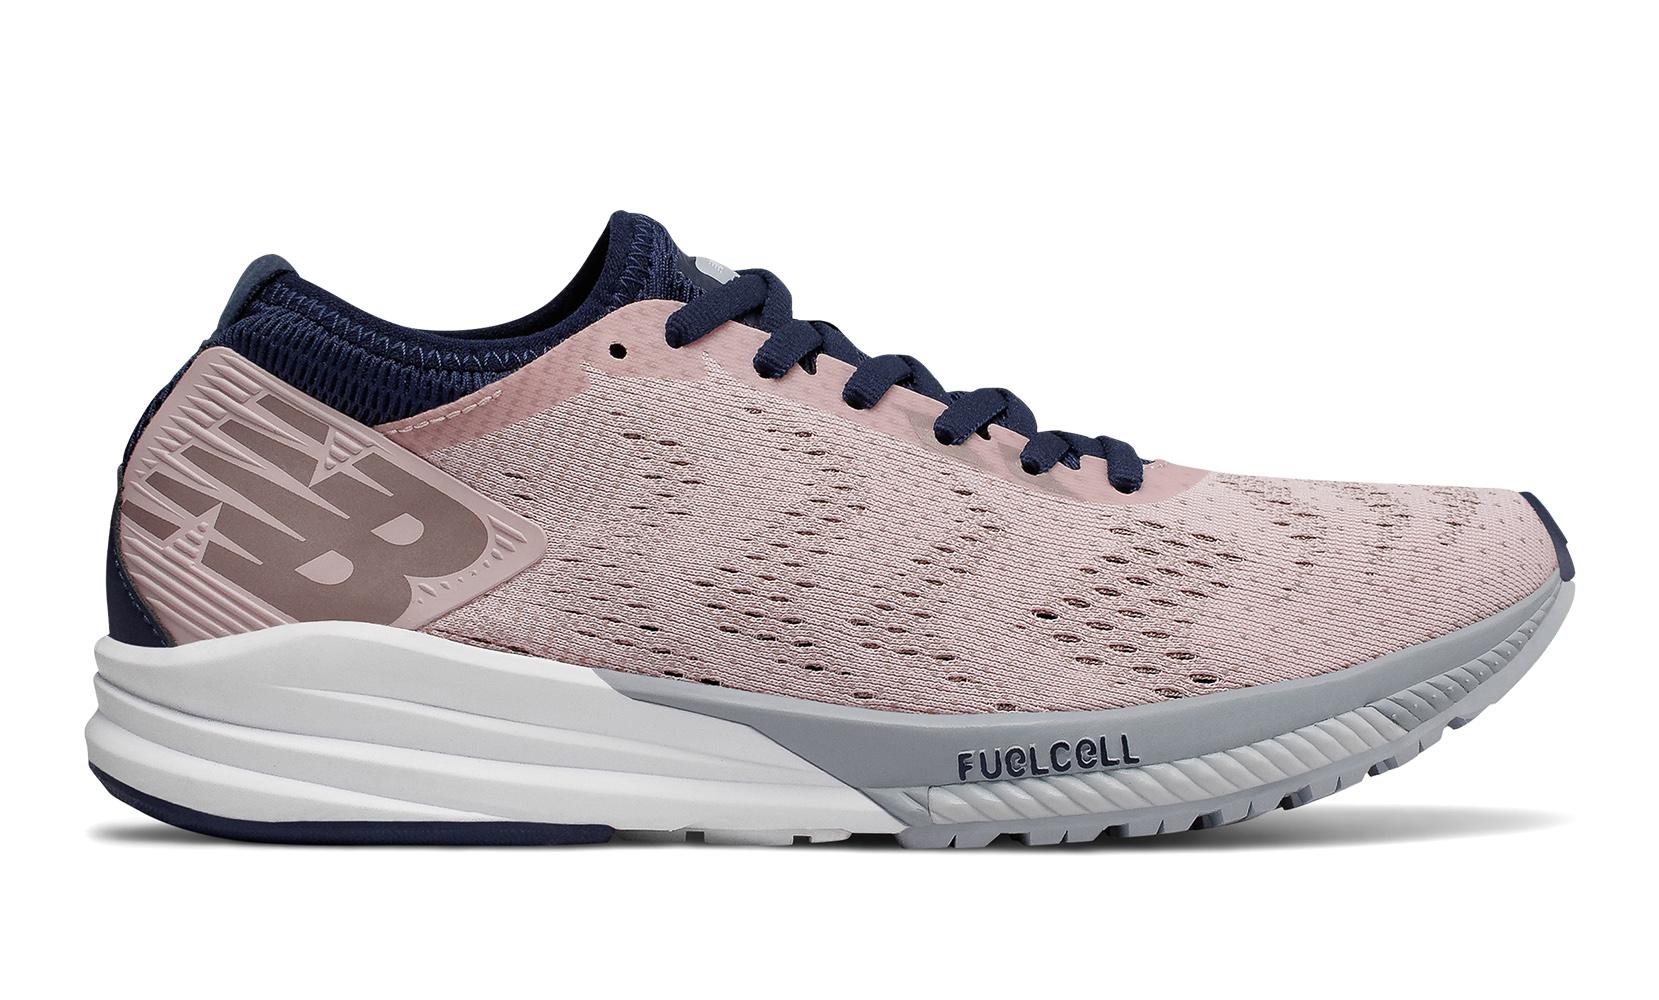 Жіноче взуття для бігу New Balance FuelCell Impulse  WFCIMPB | New Balance